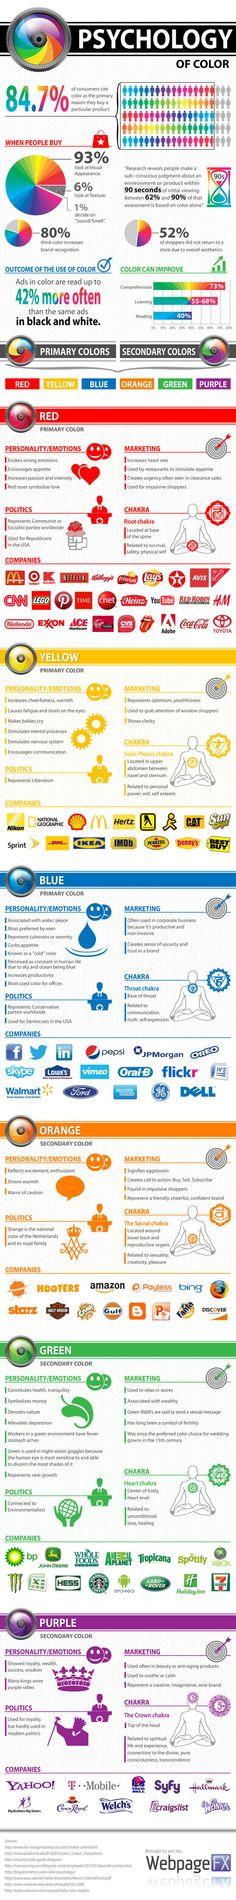 La psicología del color: Como afecta a las decisiones de compra - The Psychology of Color: How it Affects Buying Decisions